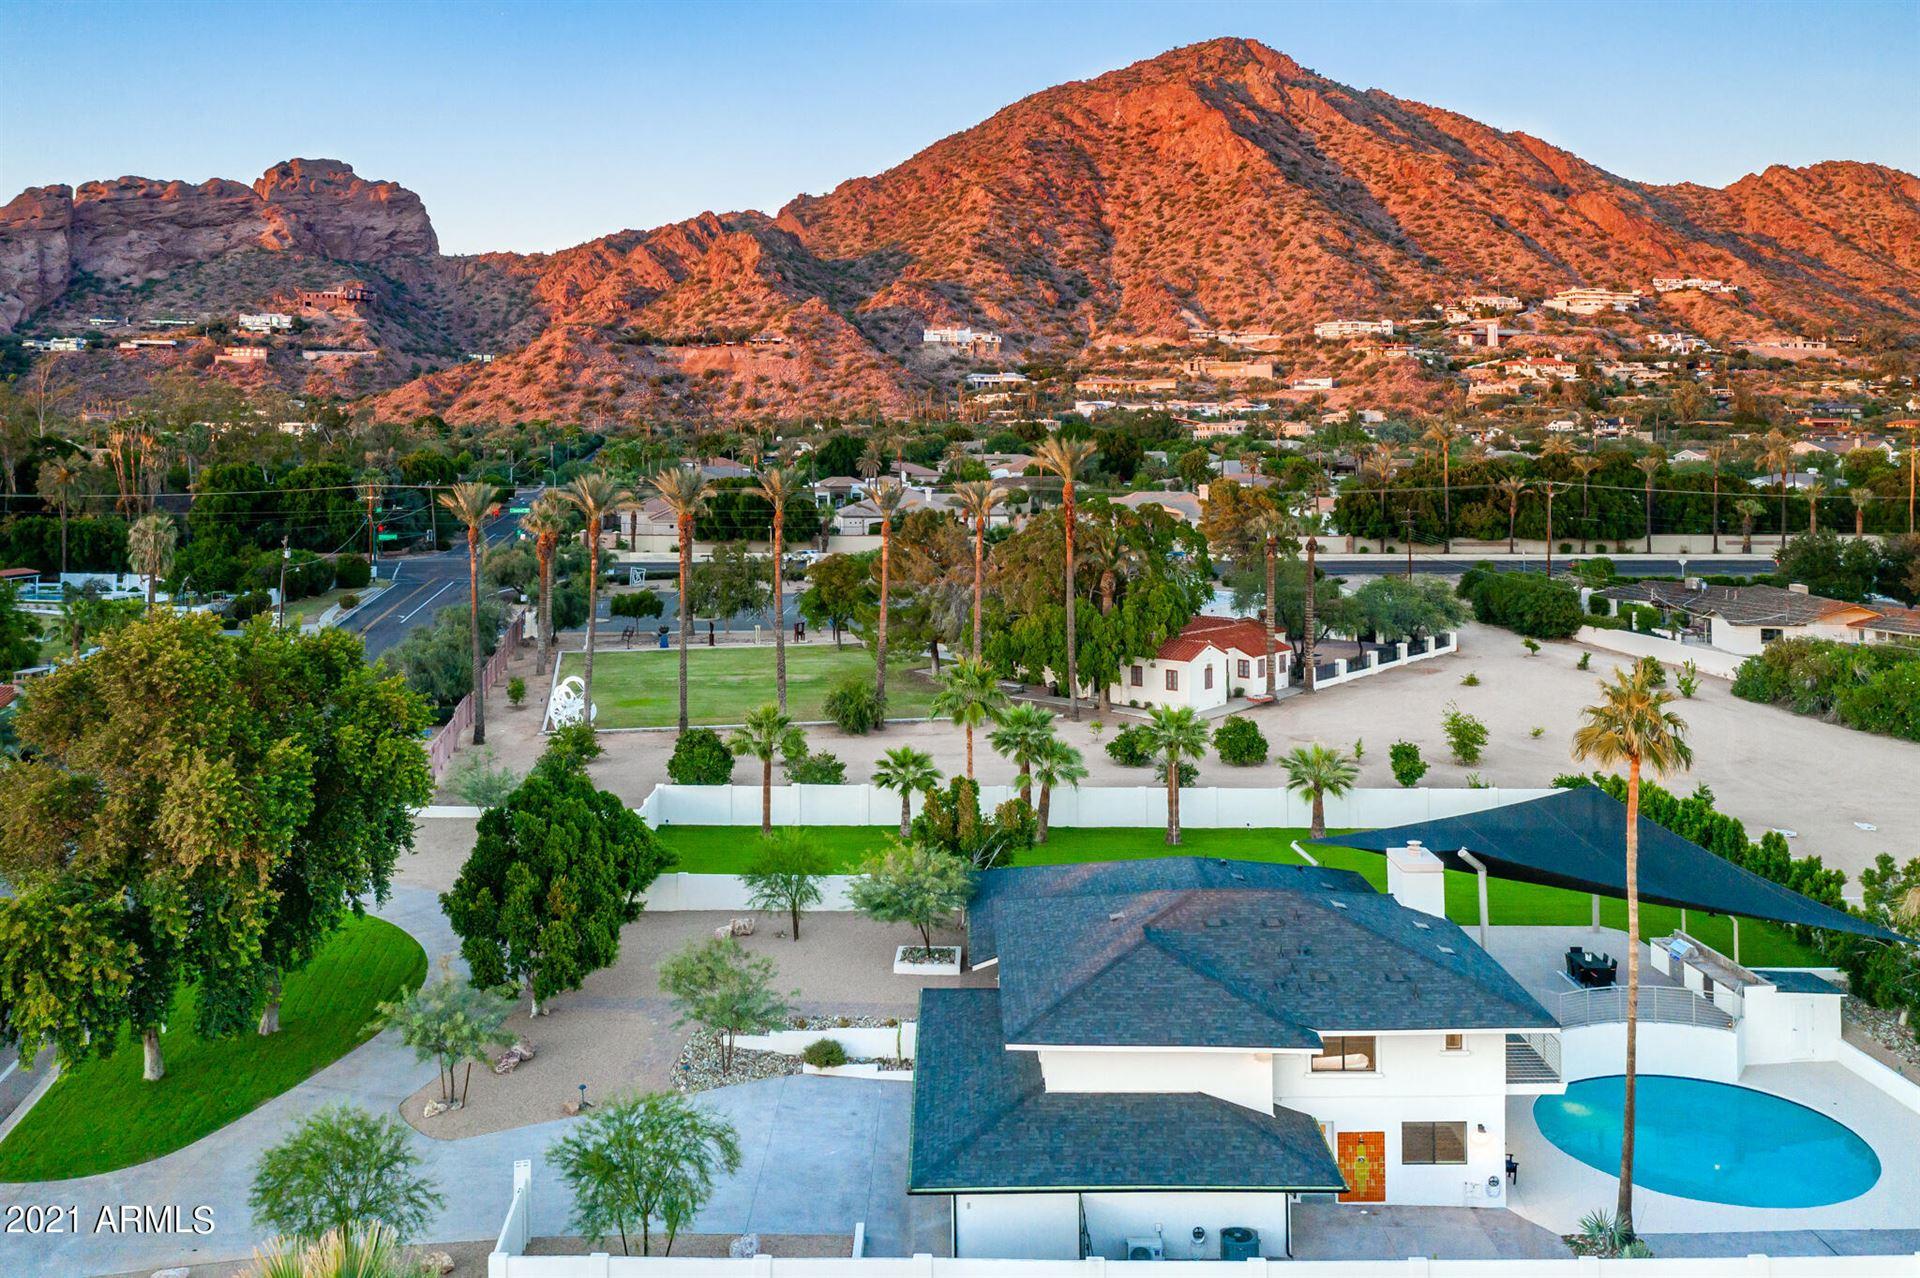 4601 N ARCADIA Drive, Phoenix, AZ 85018 - MLS#: 6302696